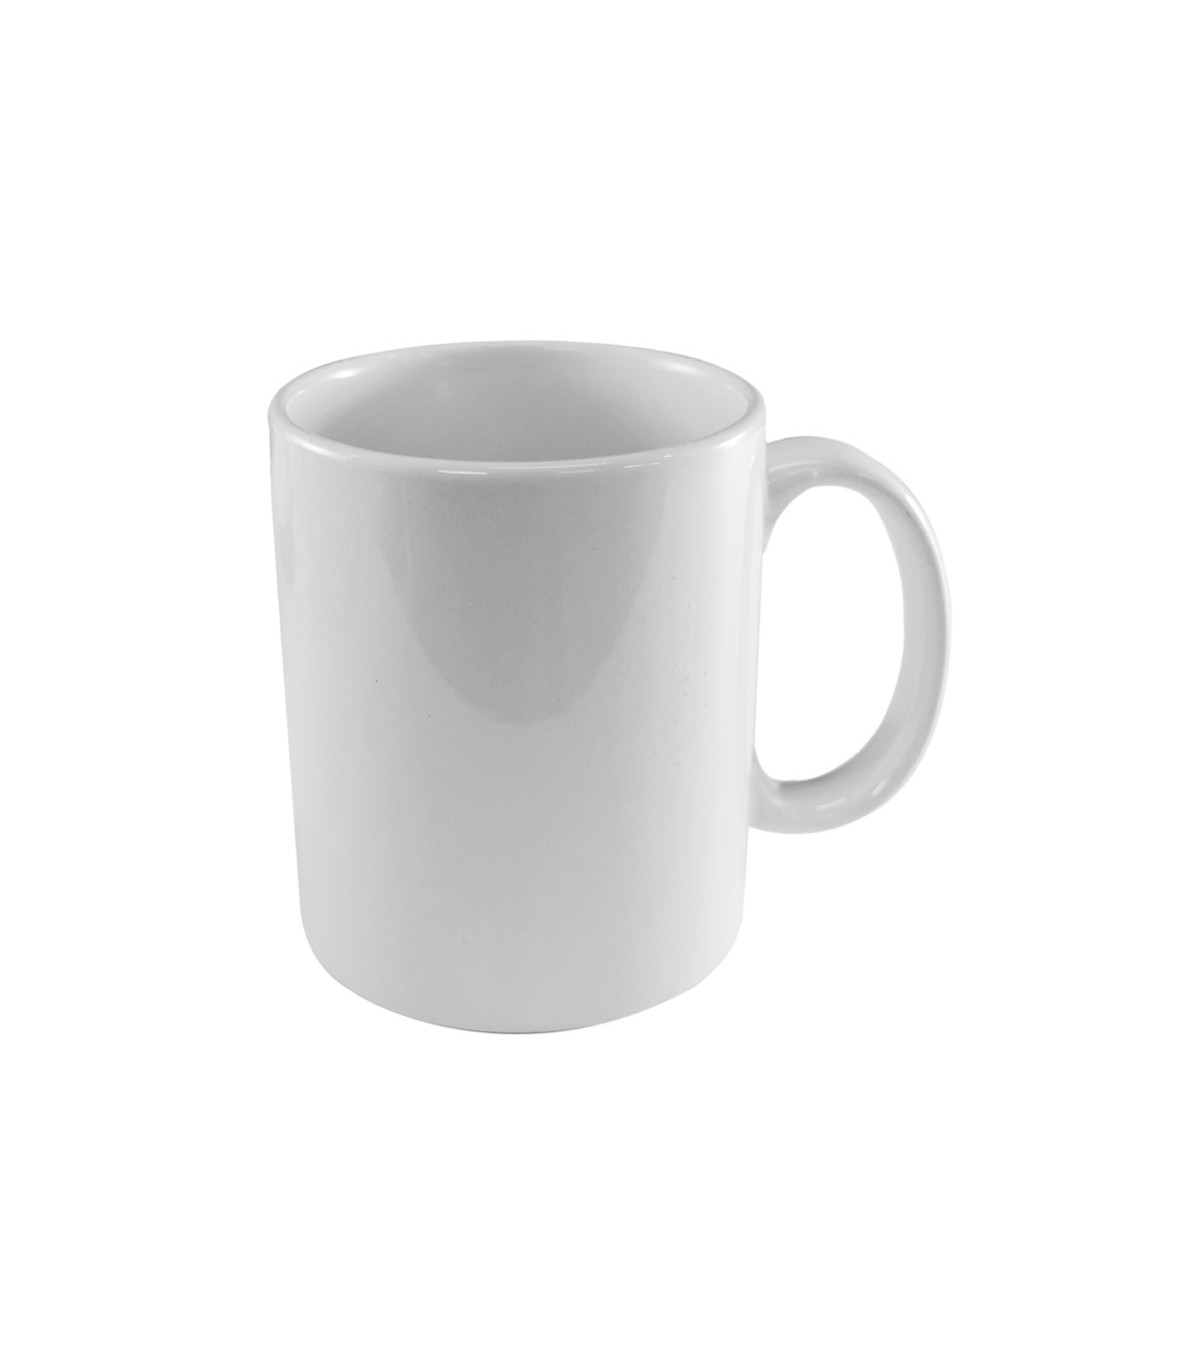 Taza blanca para sublimación ts01